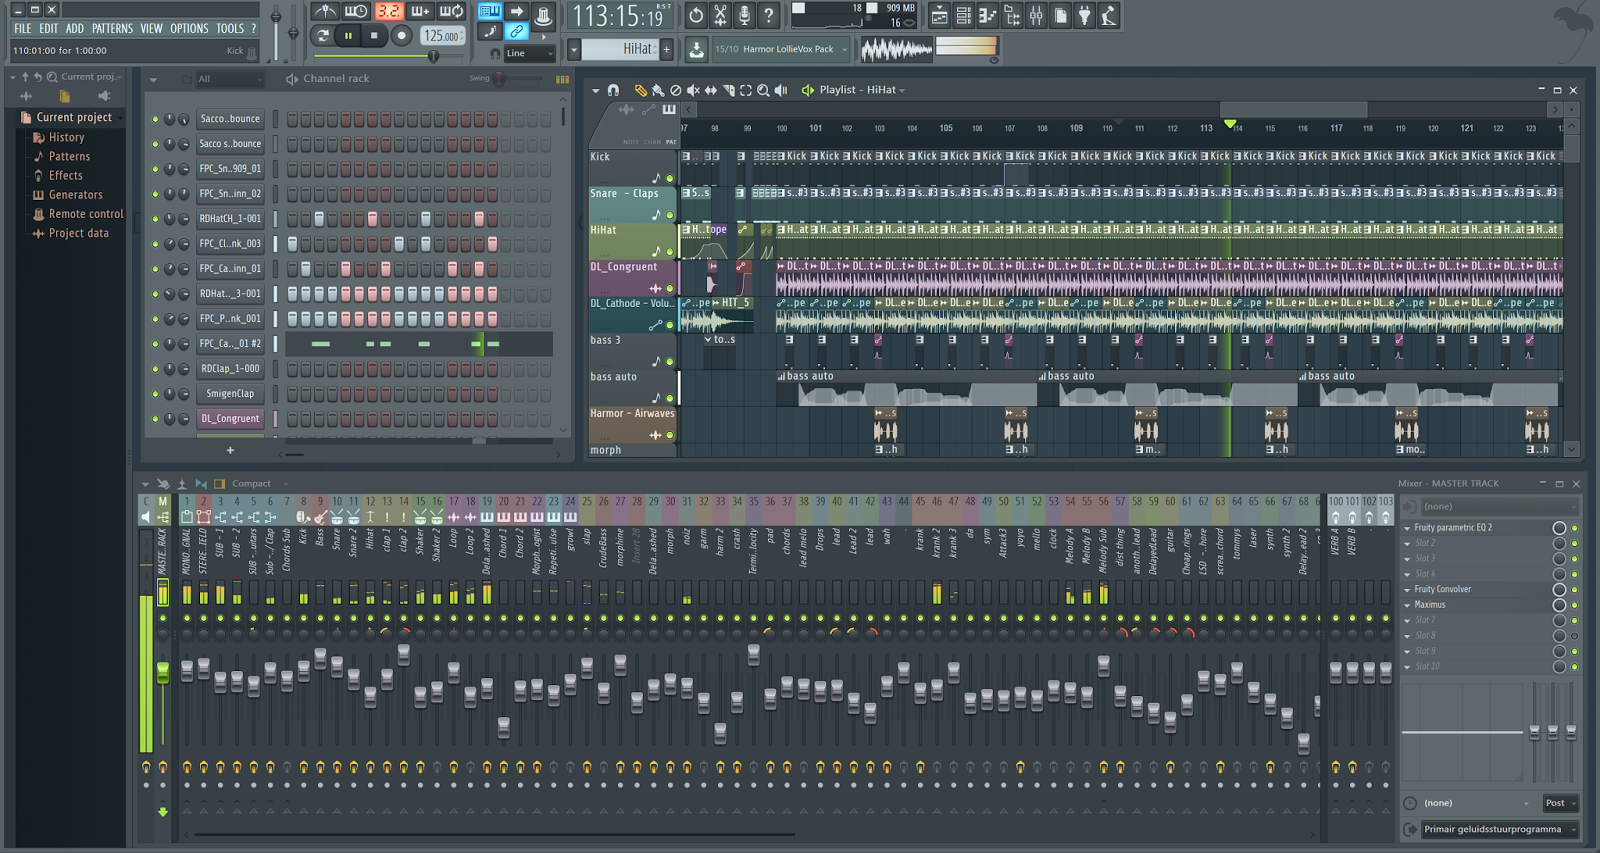 fl studio 12 full download free